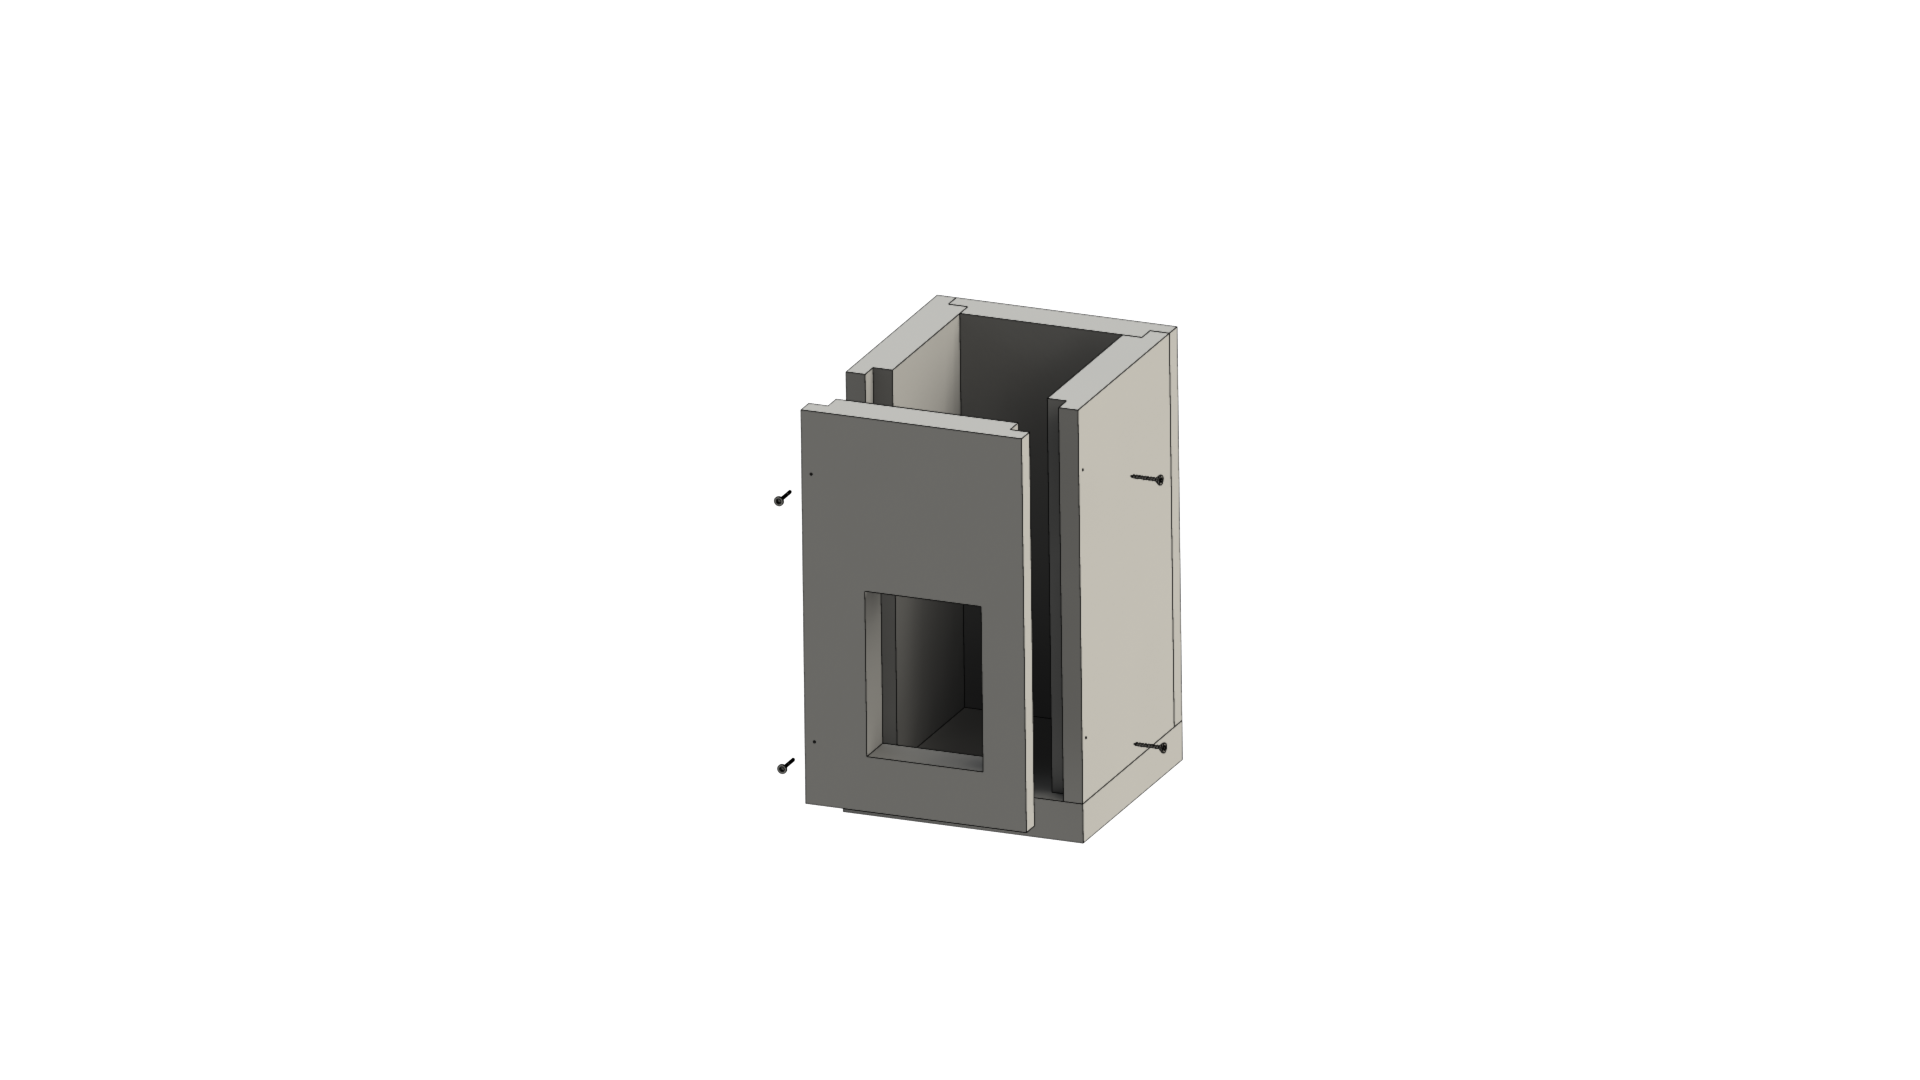 Leichtbauschornstein - Sockelelement 500 mm - Jeremias F90